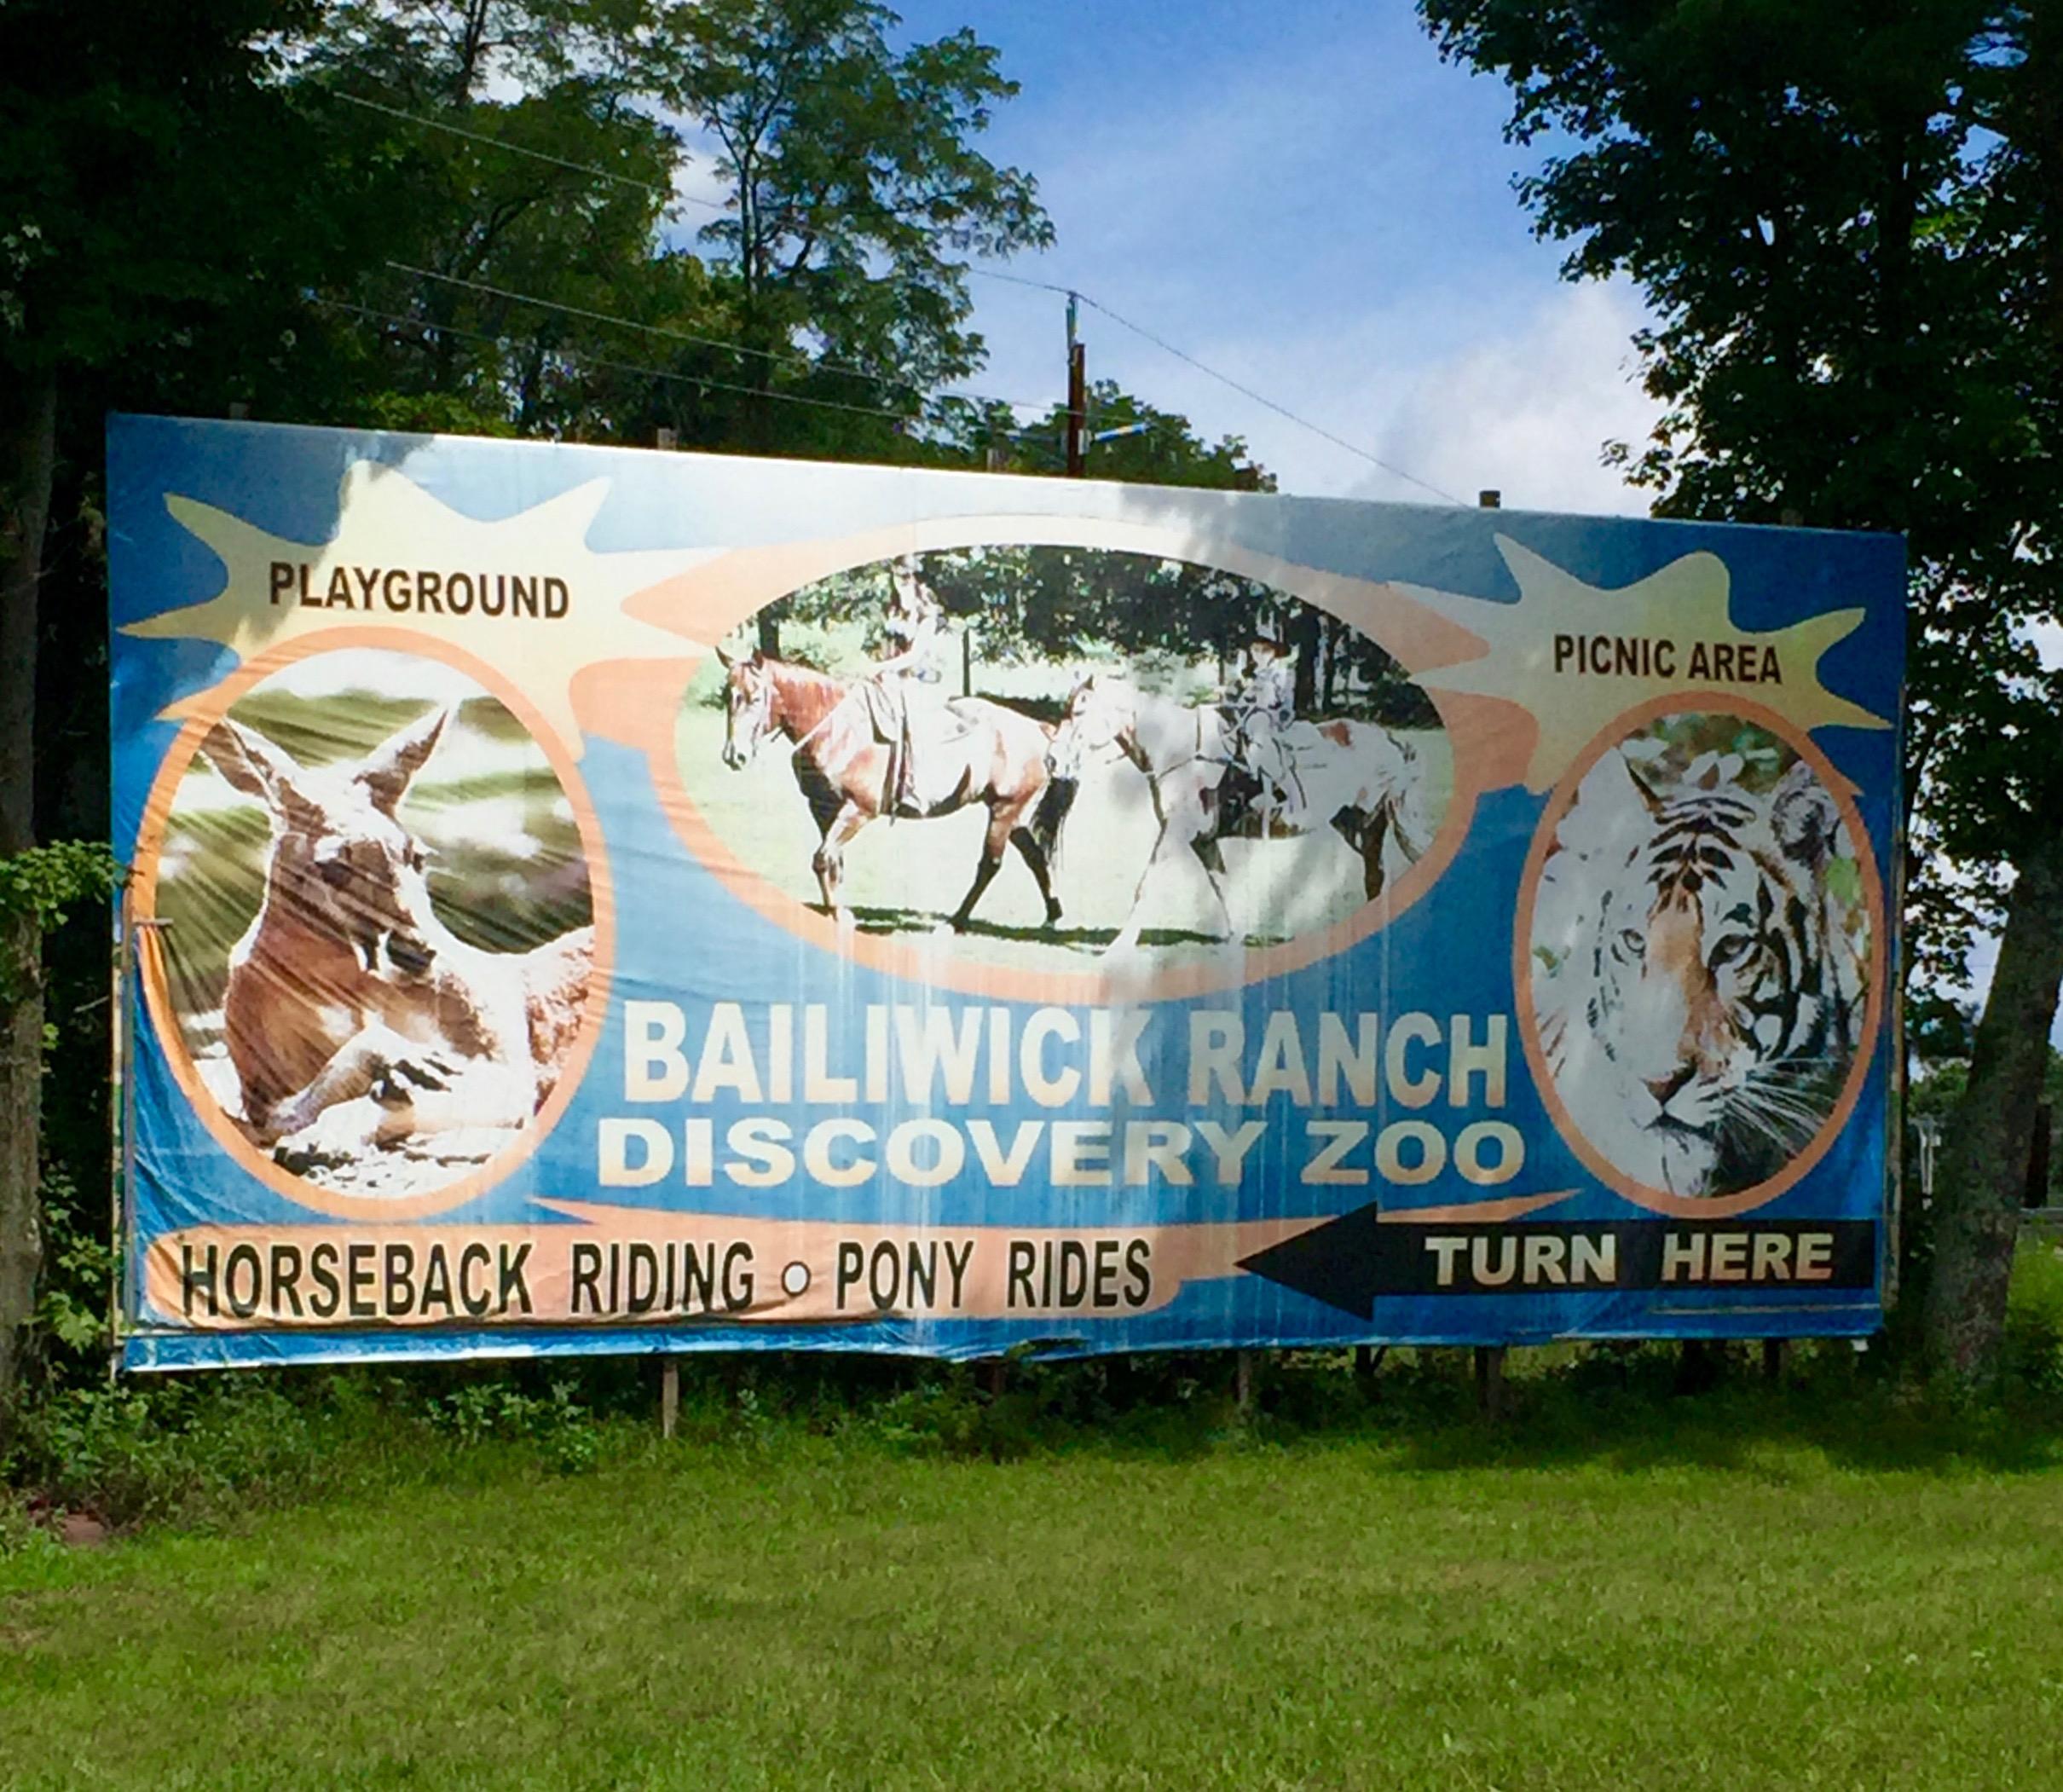 Bailiwick Ranch and Discovery Zoo billboard